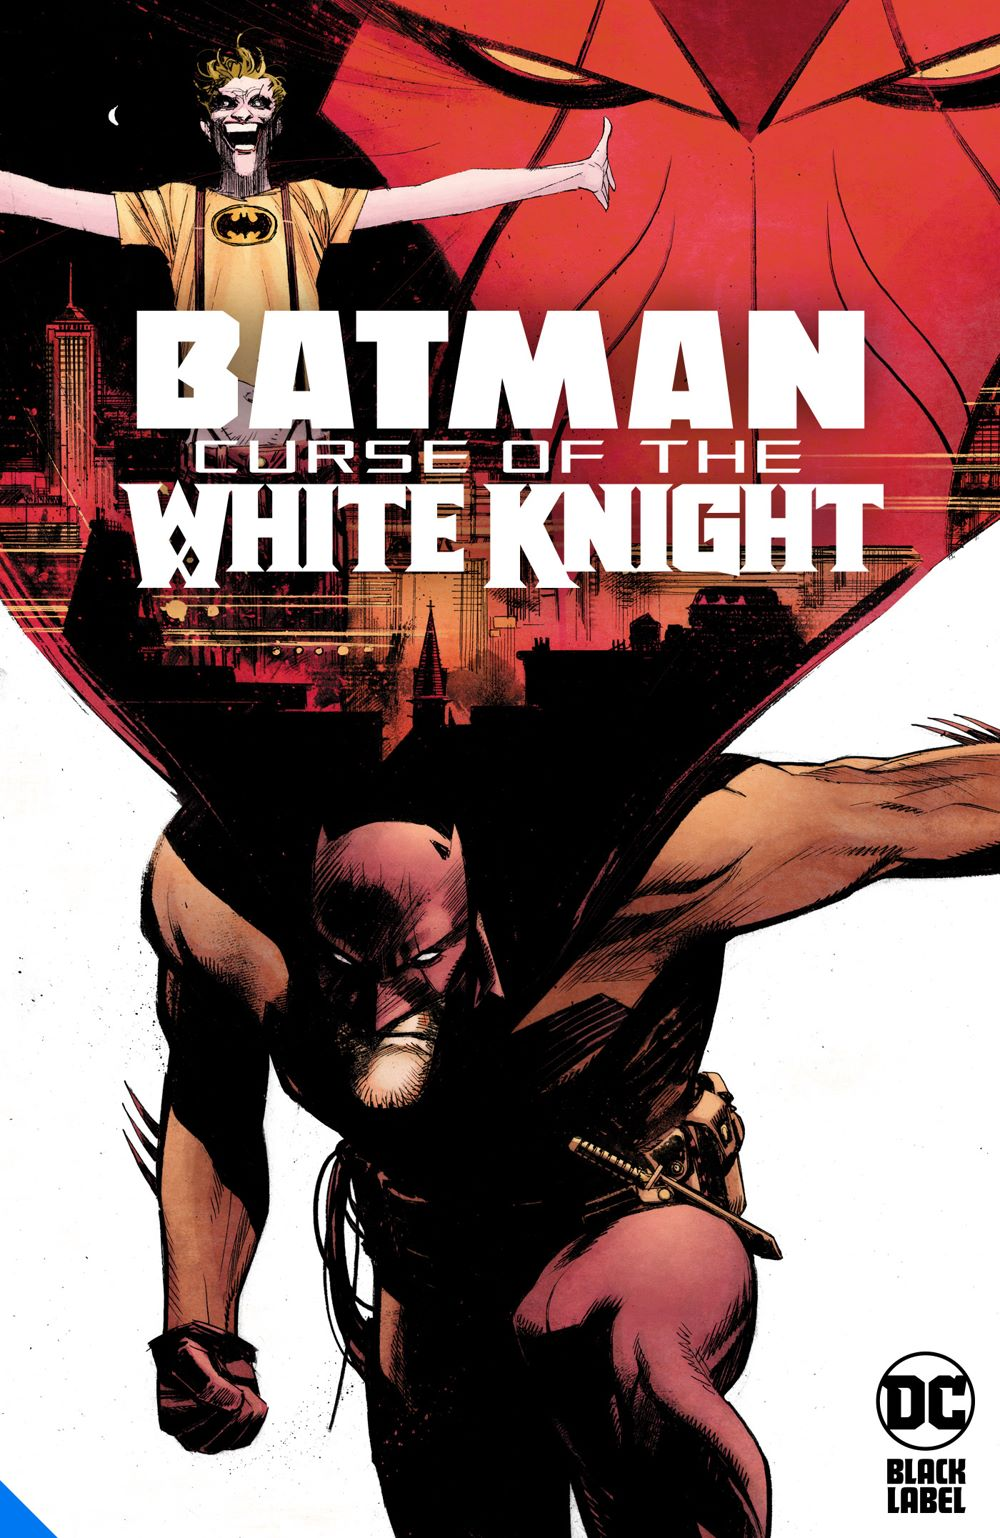 batmancurseofthewhiteknight_adv DC Comics August 2021 Solicitations